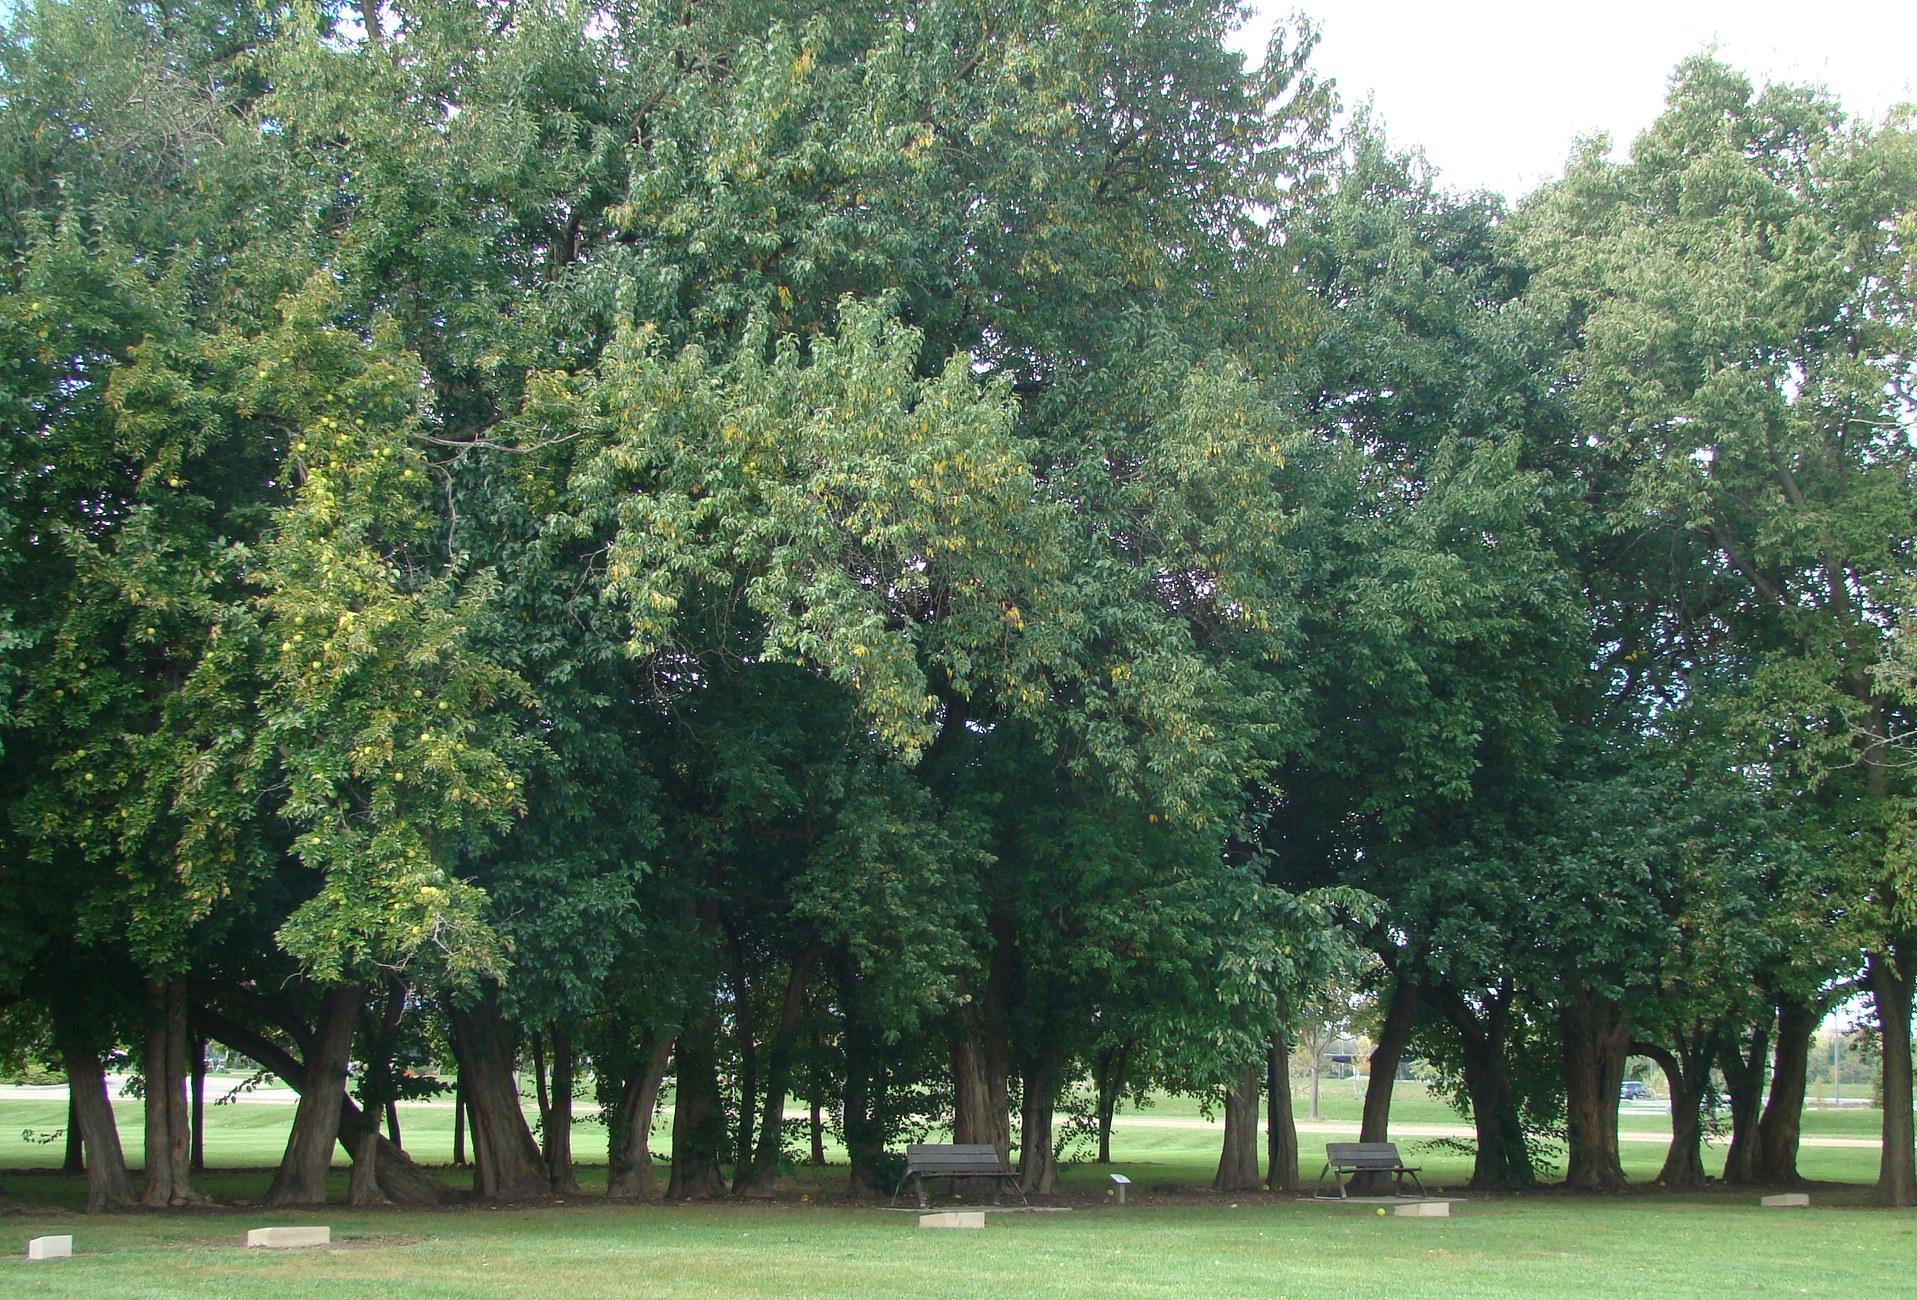 Field of Corn Osage Orange Trees